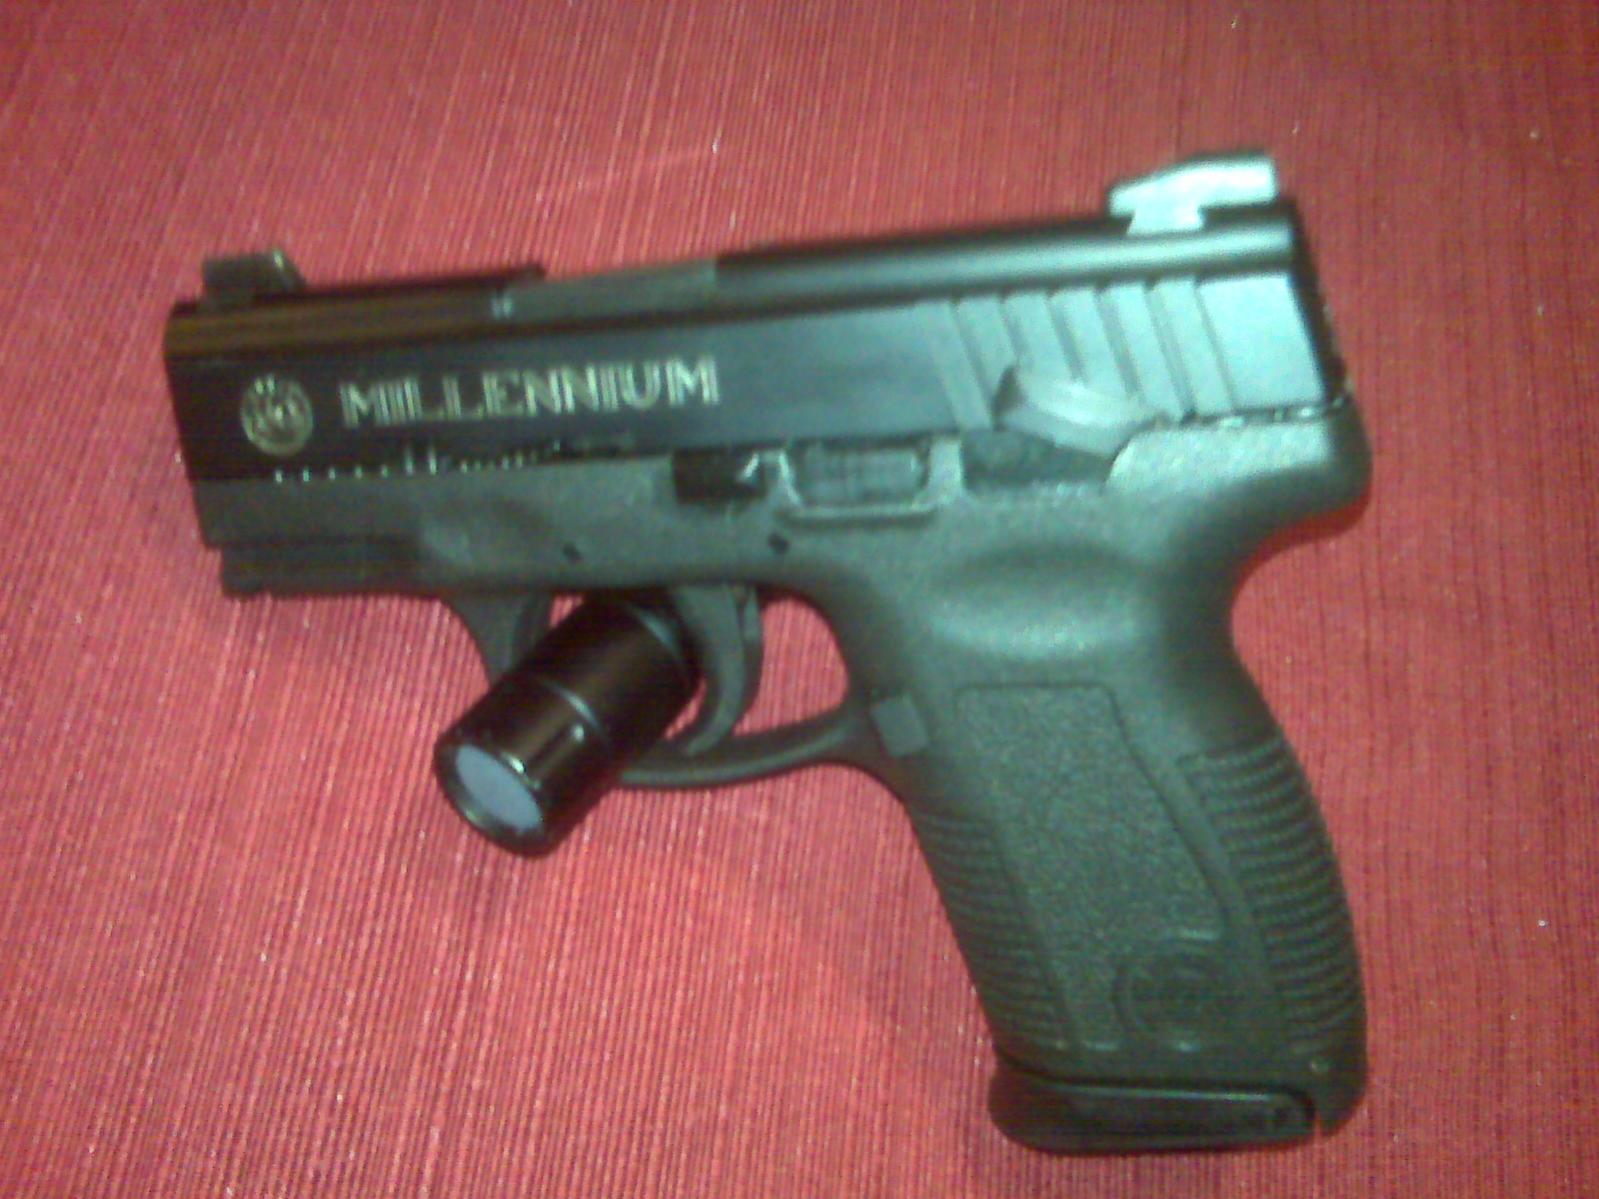 Bought a new pistol-img00136.jpg